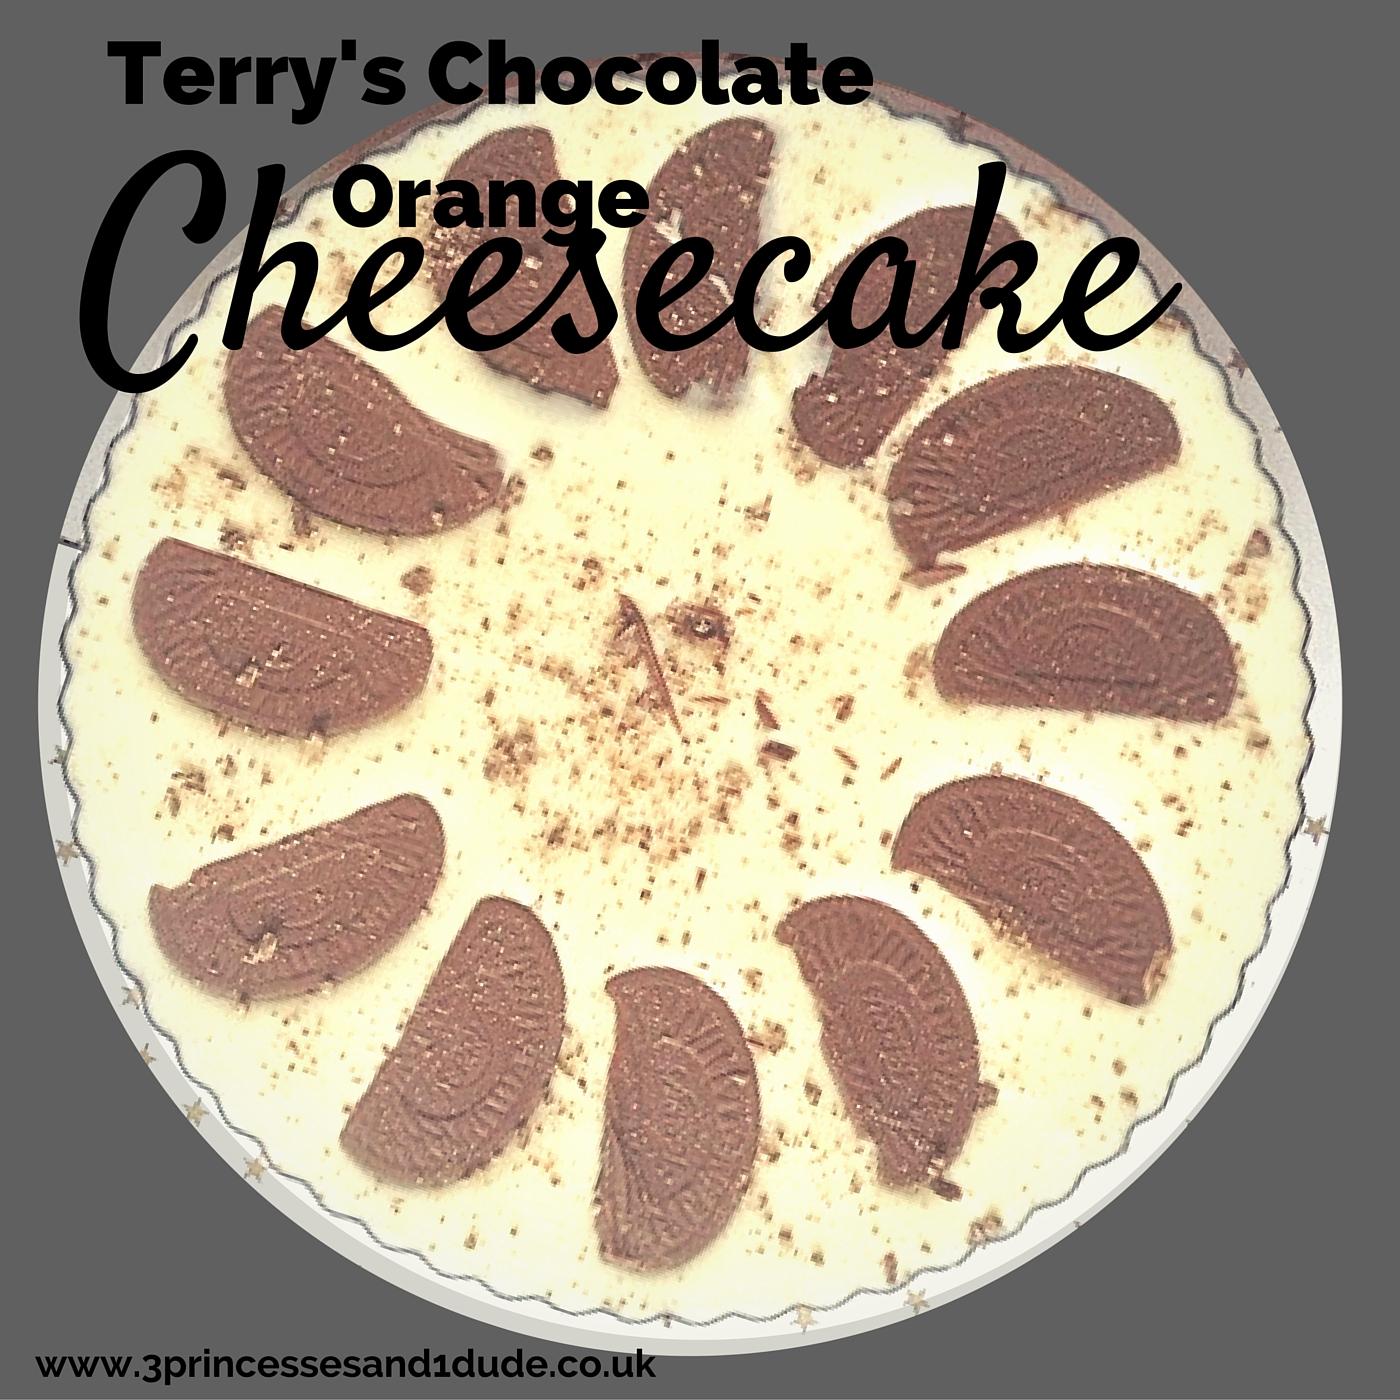 Christmas Cheesecake Ideas.3 Princesses And 1 Dude Terry S Chocolate Orange